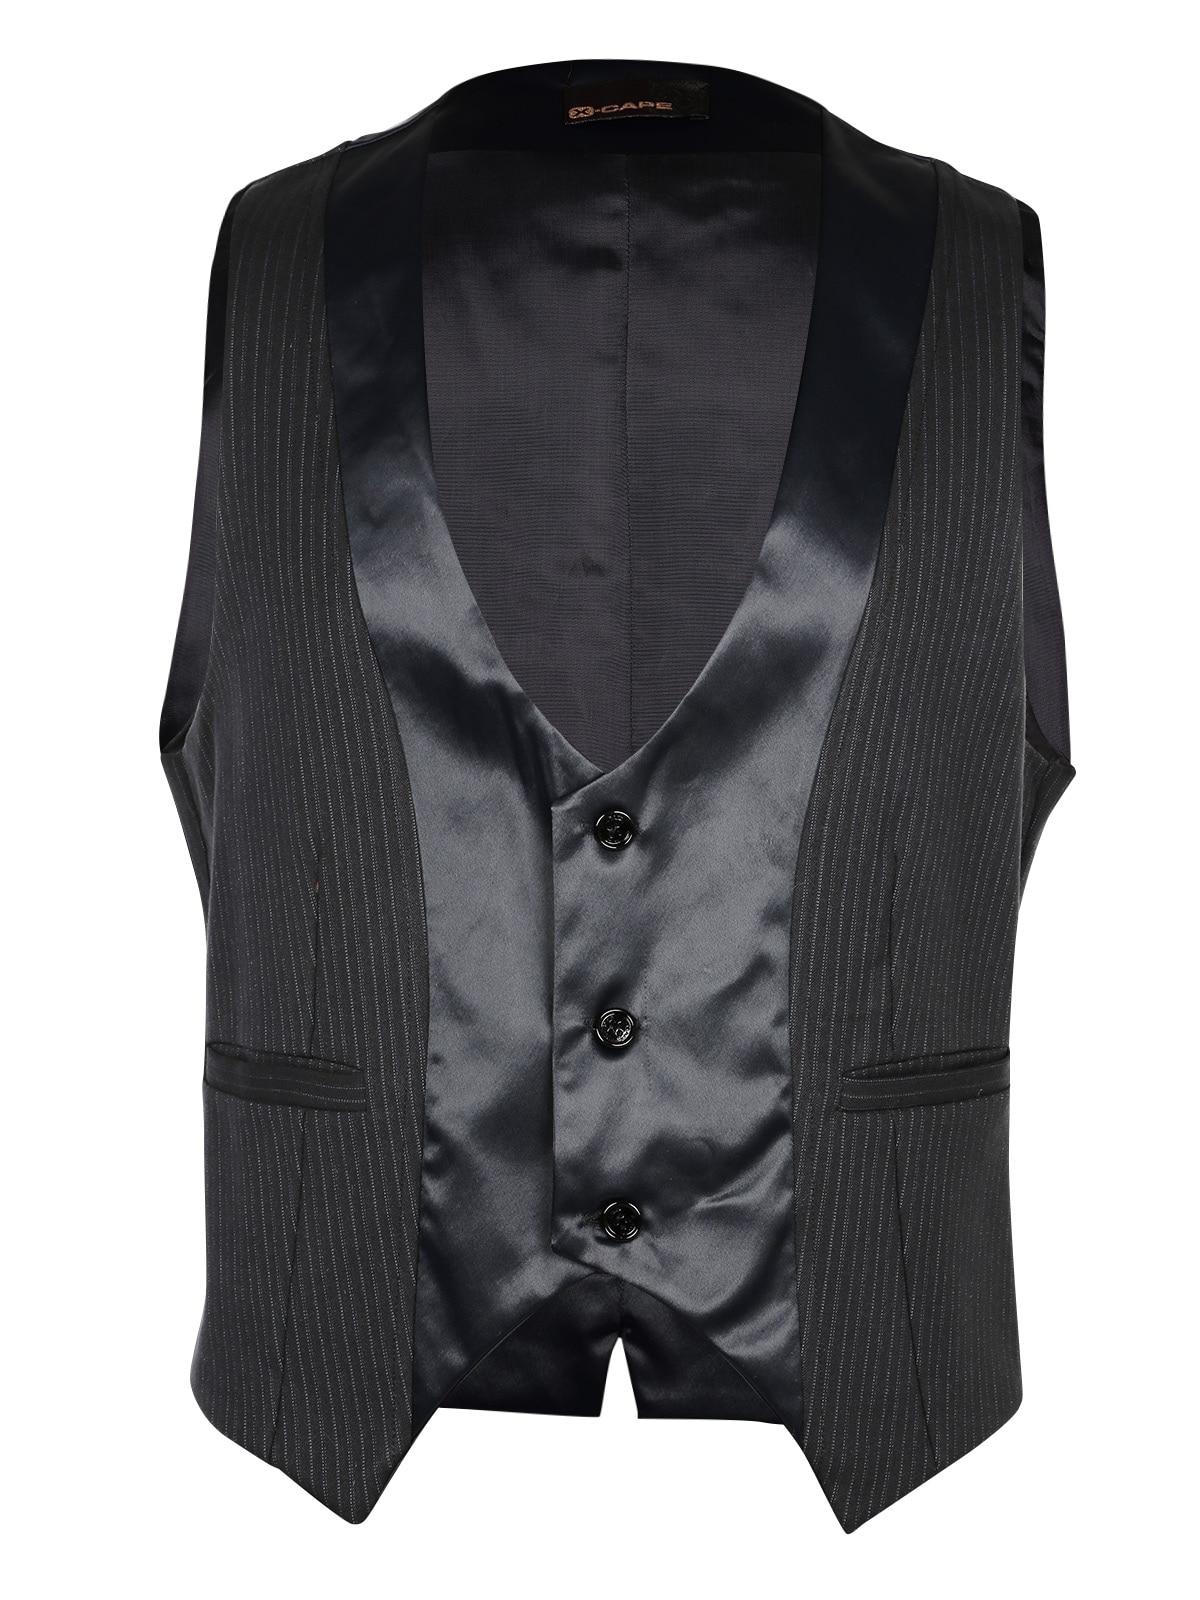 Stylish Black Pinstripe